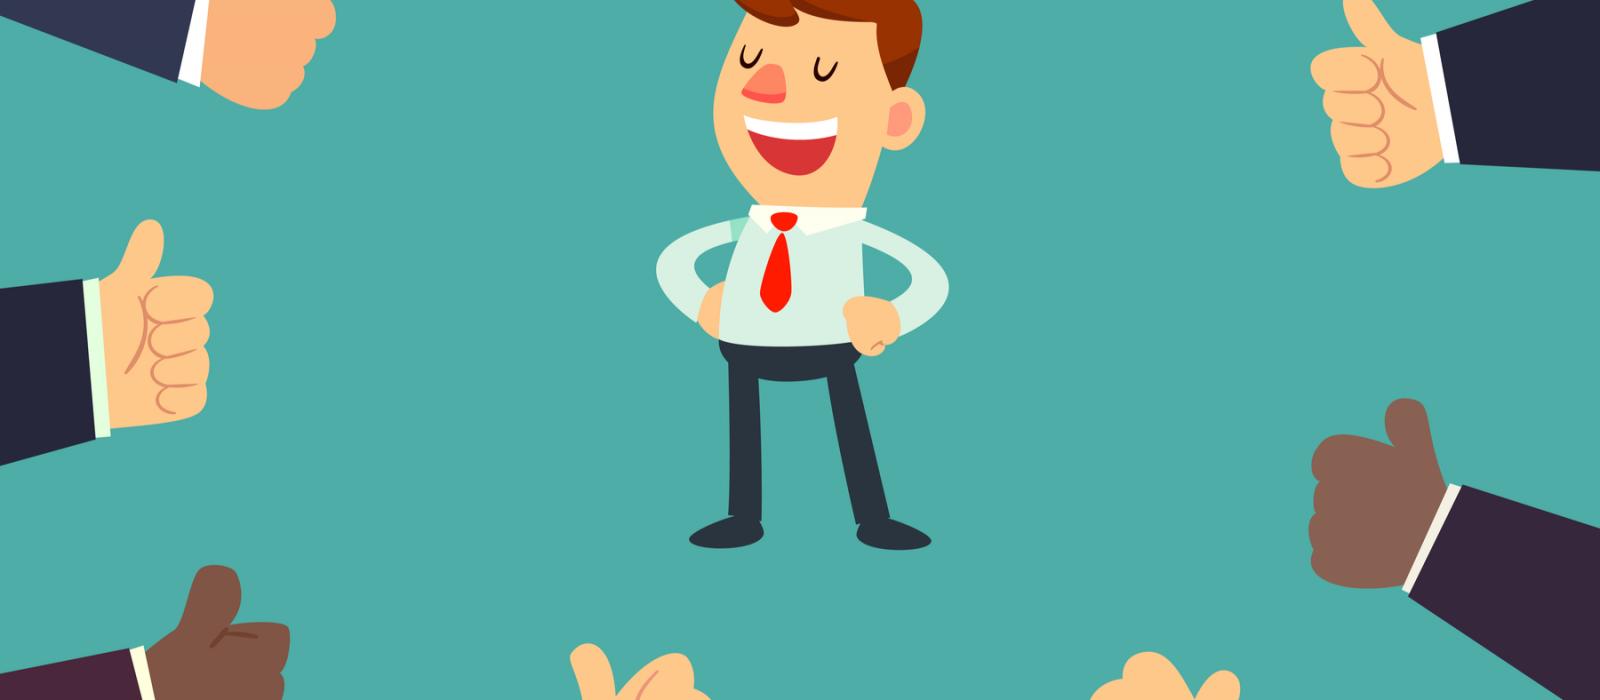 Pautas para un liderazgo efectivo